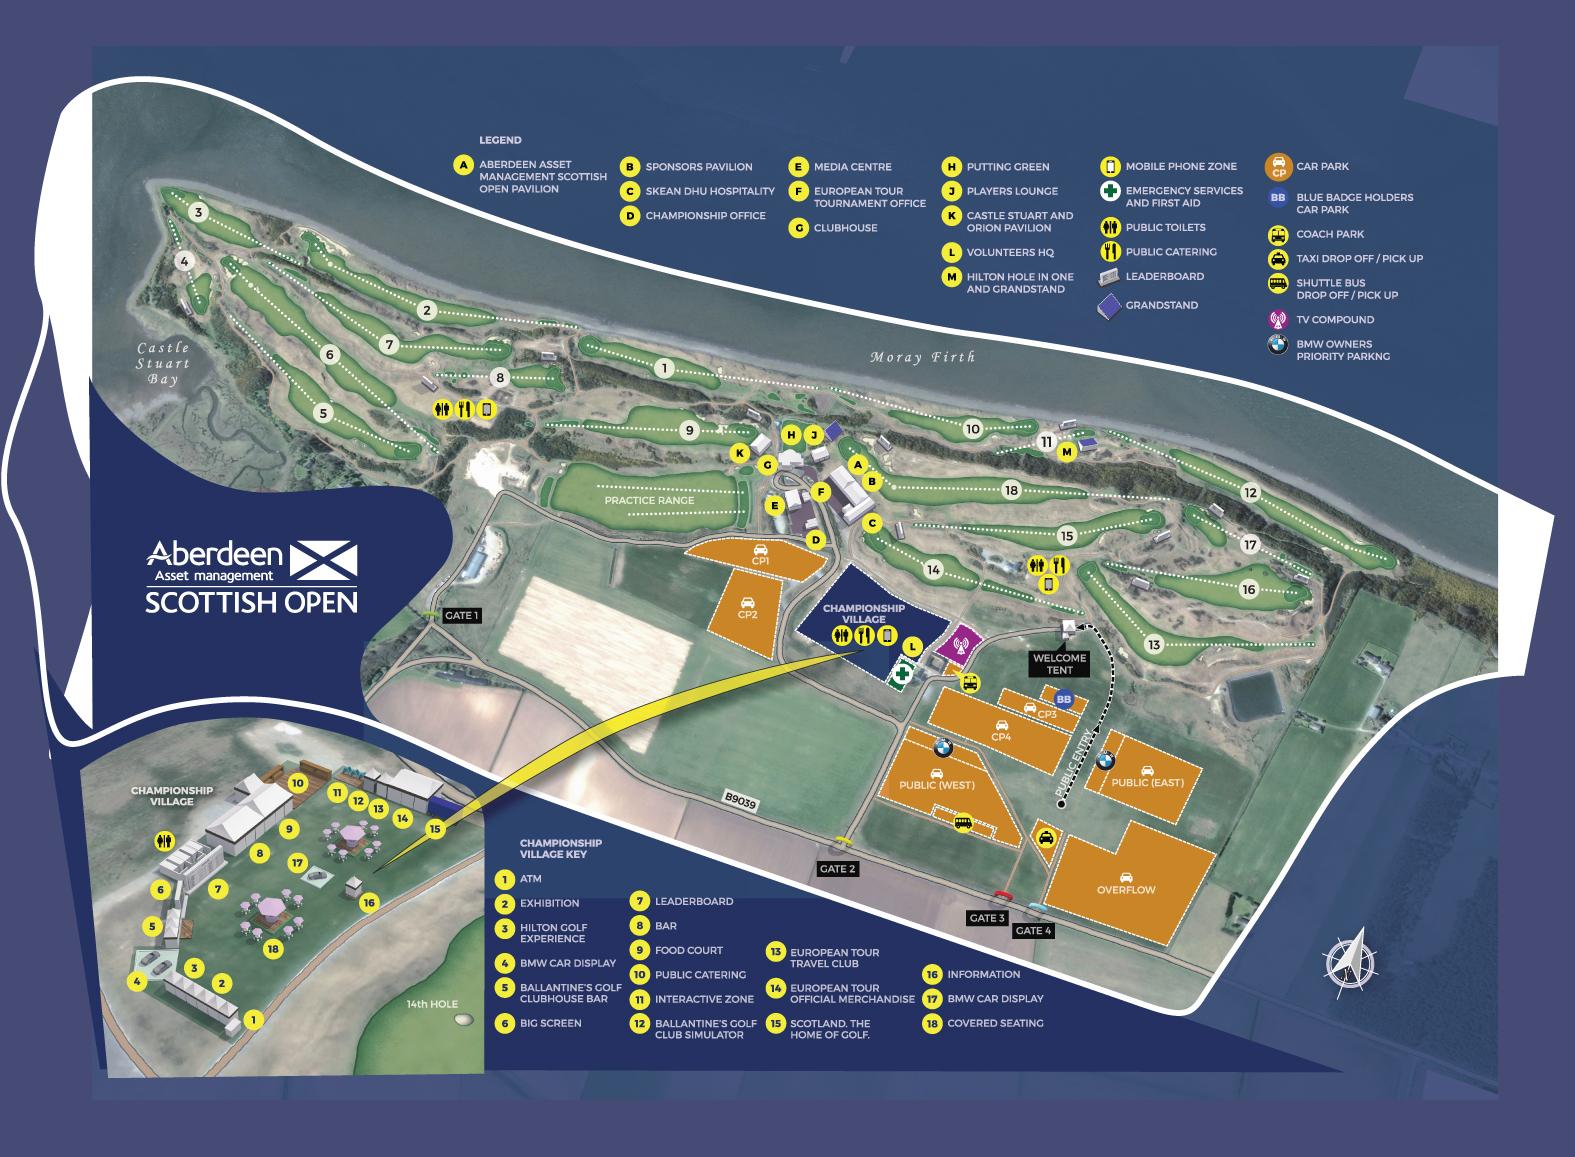 Scottish Open 2016 course guide